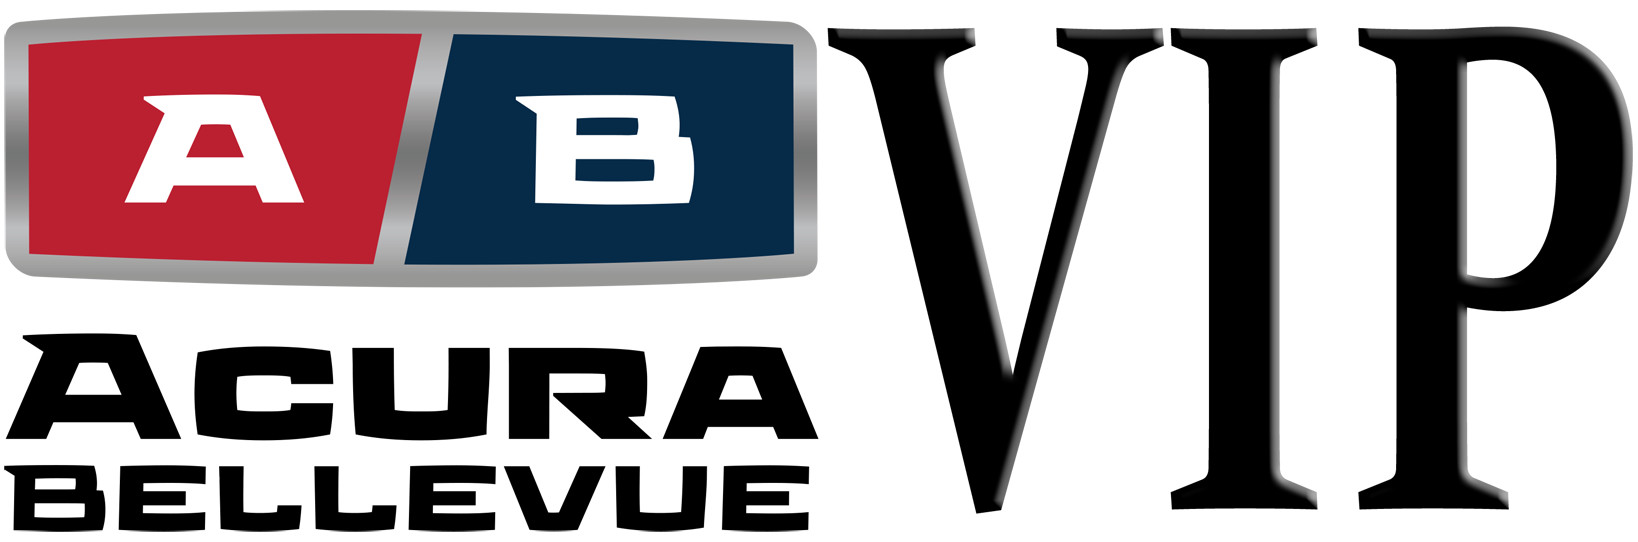 Jay Wolfe Acura >> Acura Font - NewsGlobeNewsGlobe